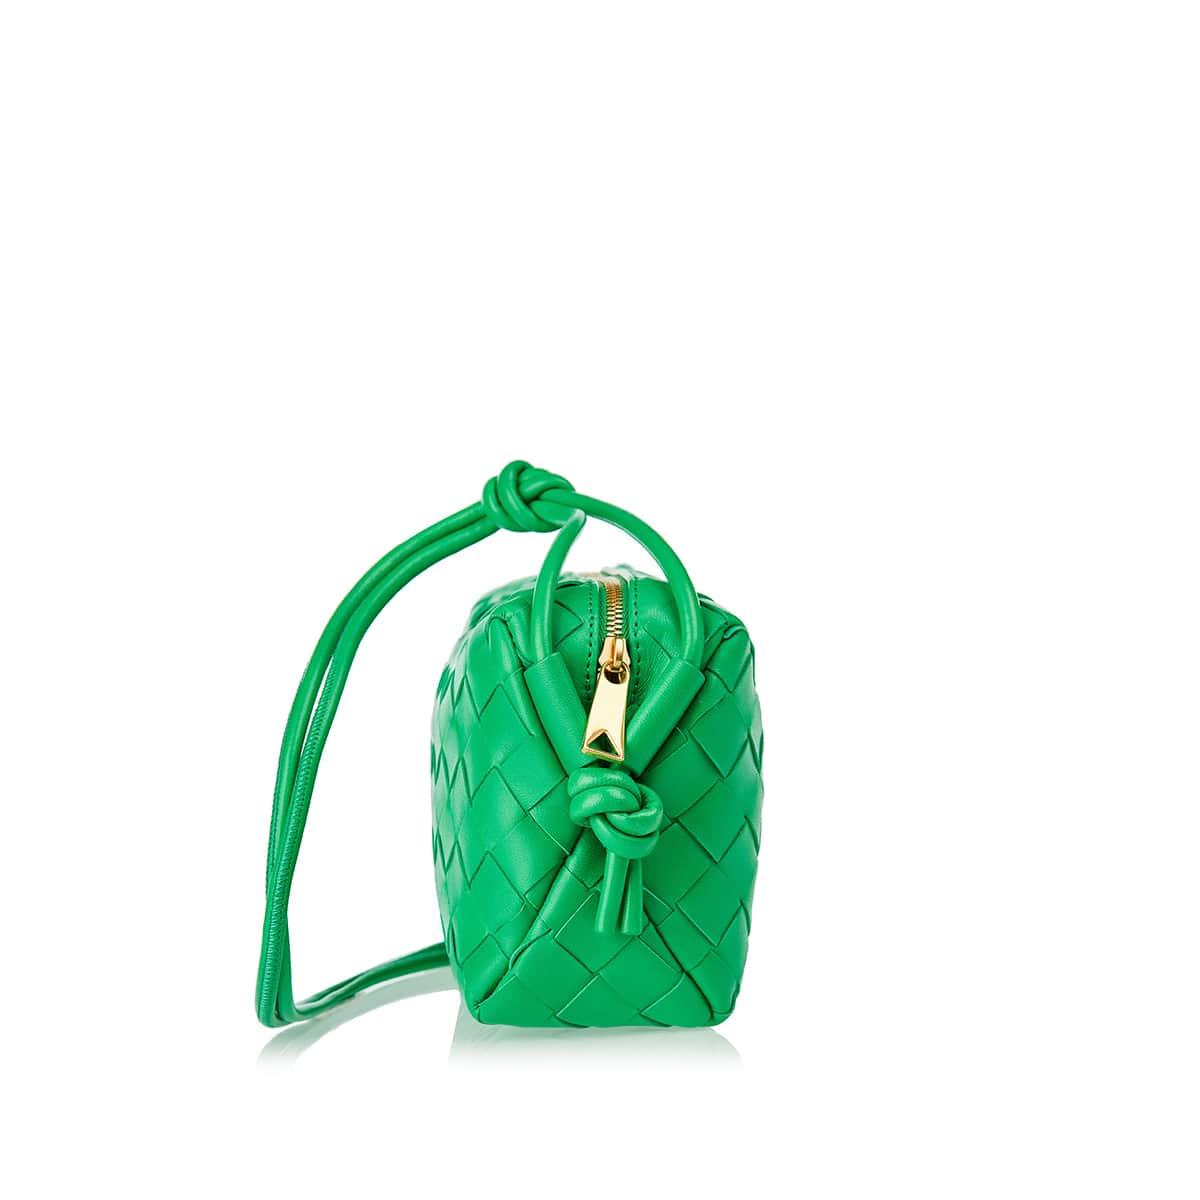 Loop mini Intrecciato leather bag